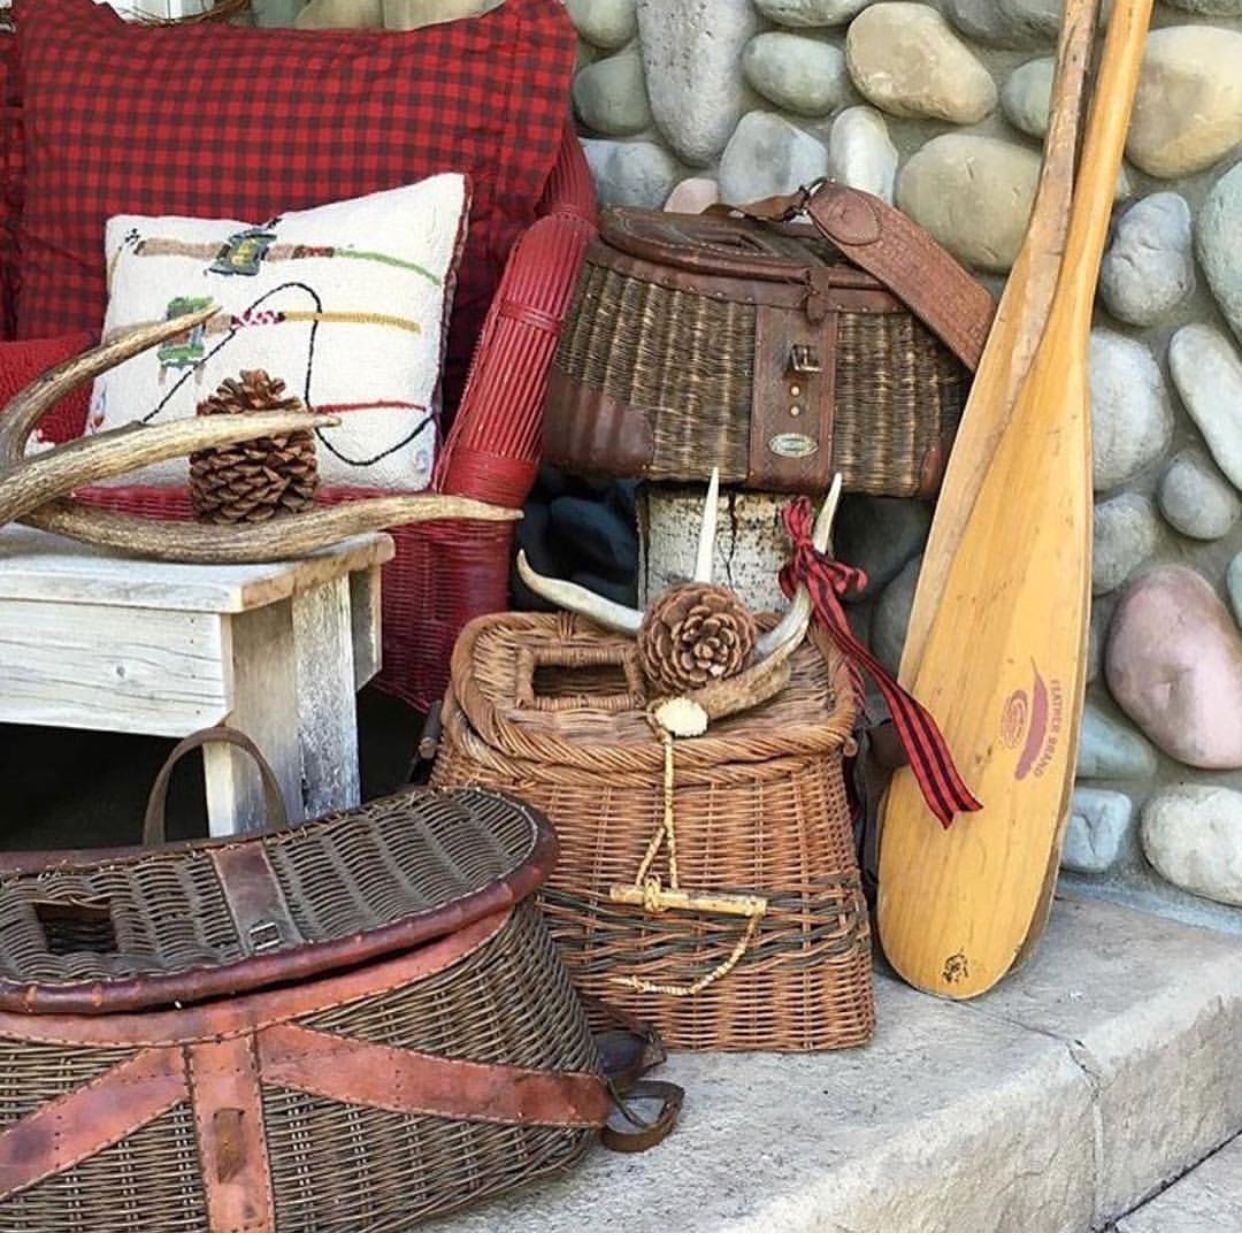 Vintage Cottage Decor For Summer Style | Rustic cabin ...